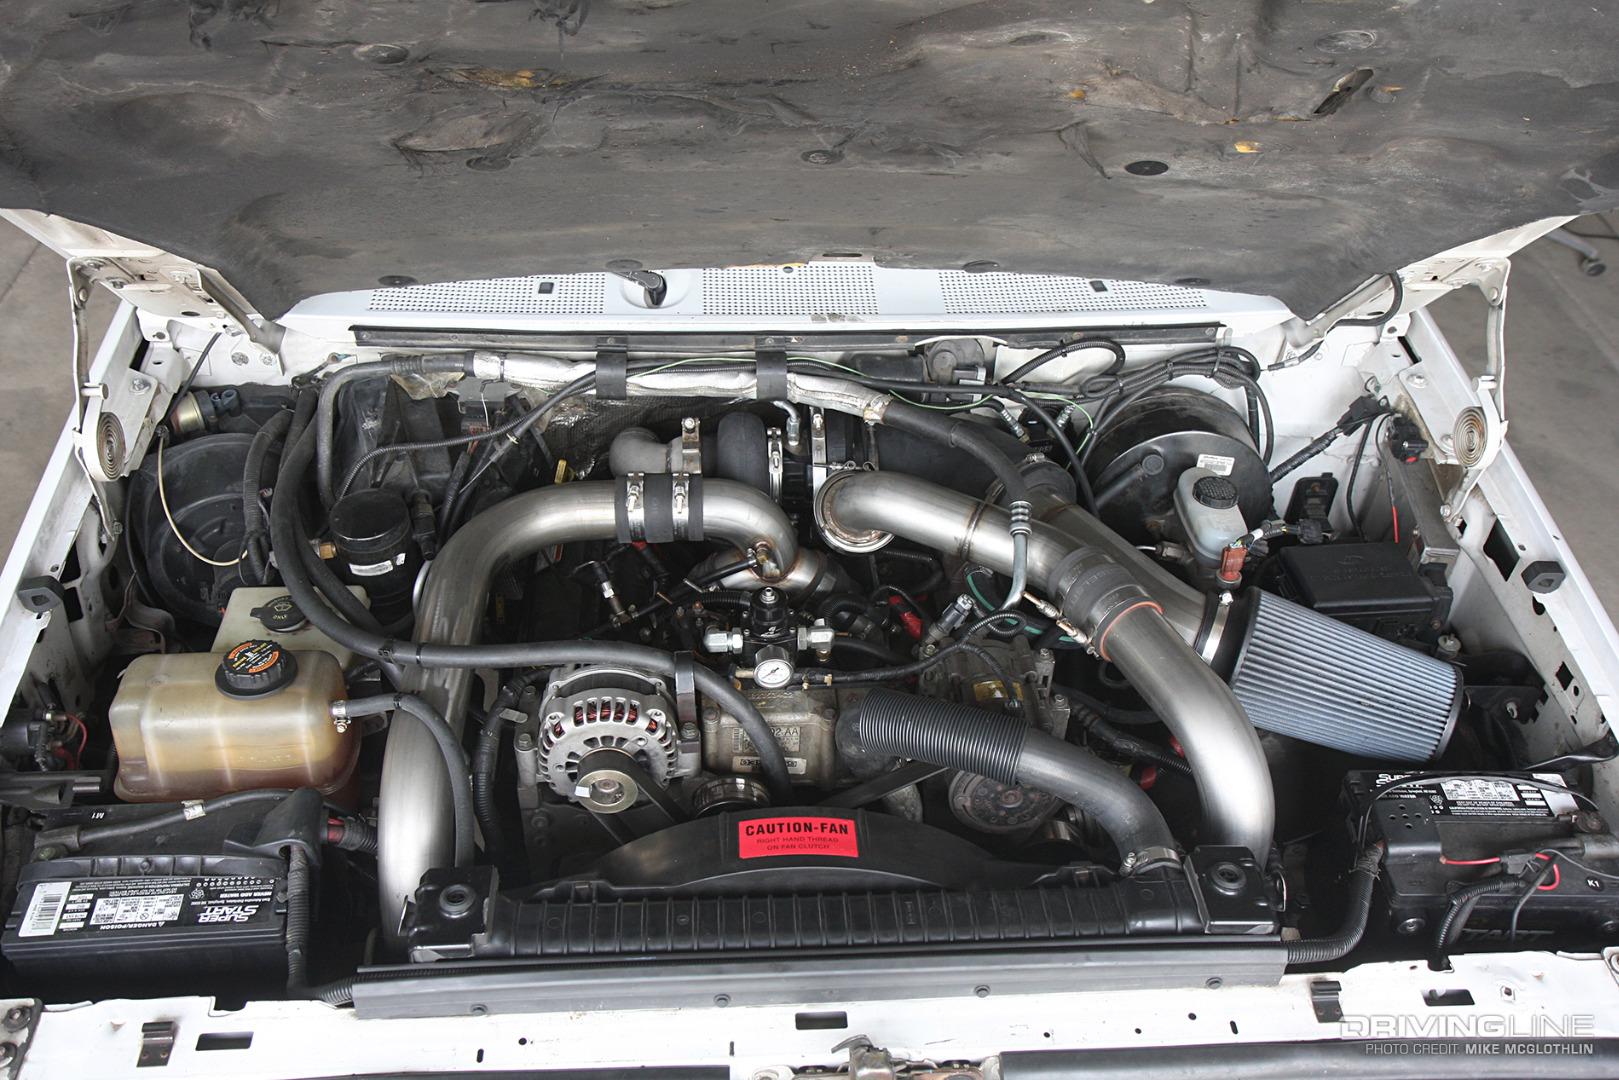 hight resolution of wiring schematic 97 ford f 250 powerstroke 73 diesel engine